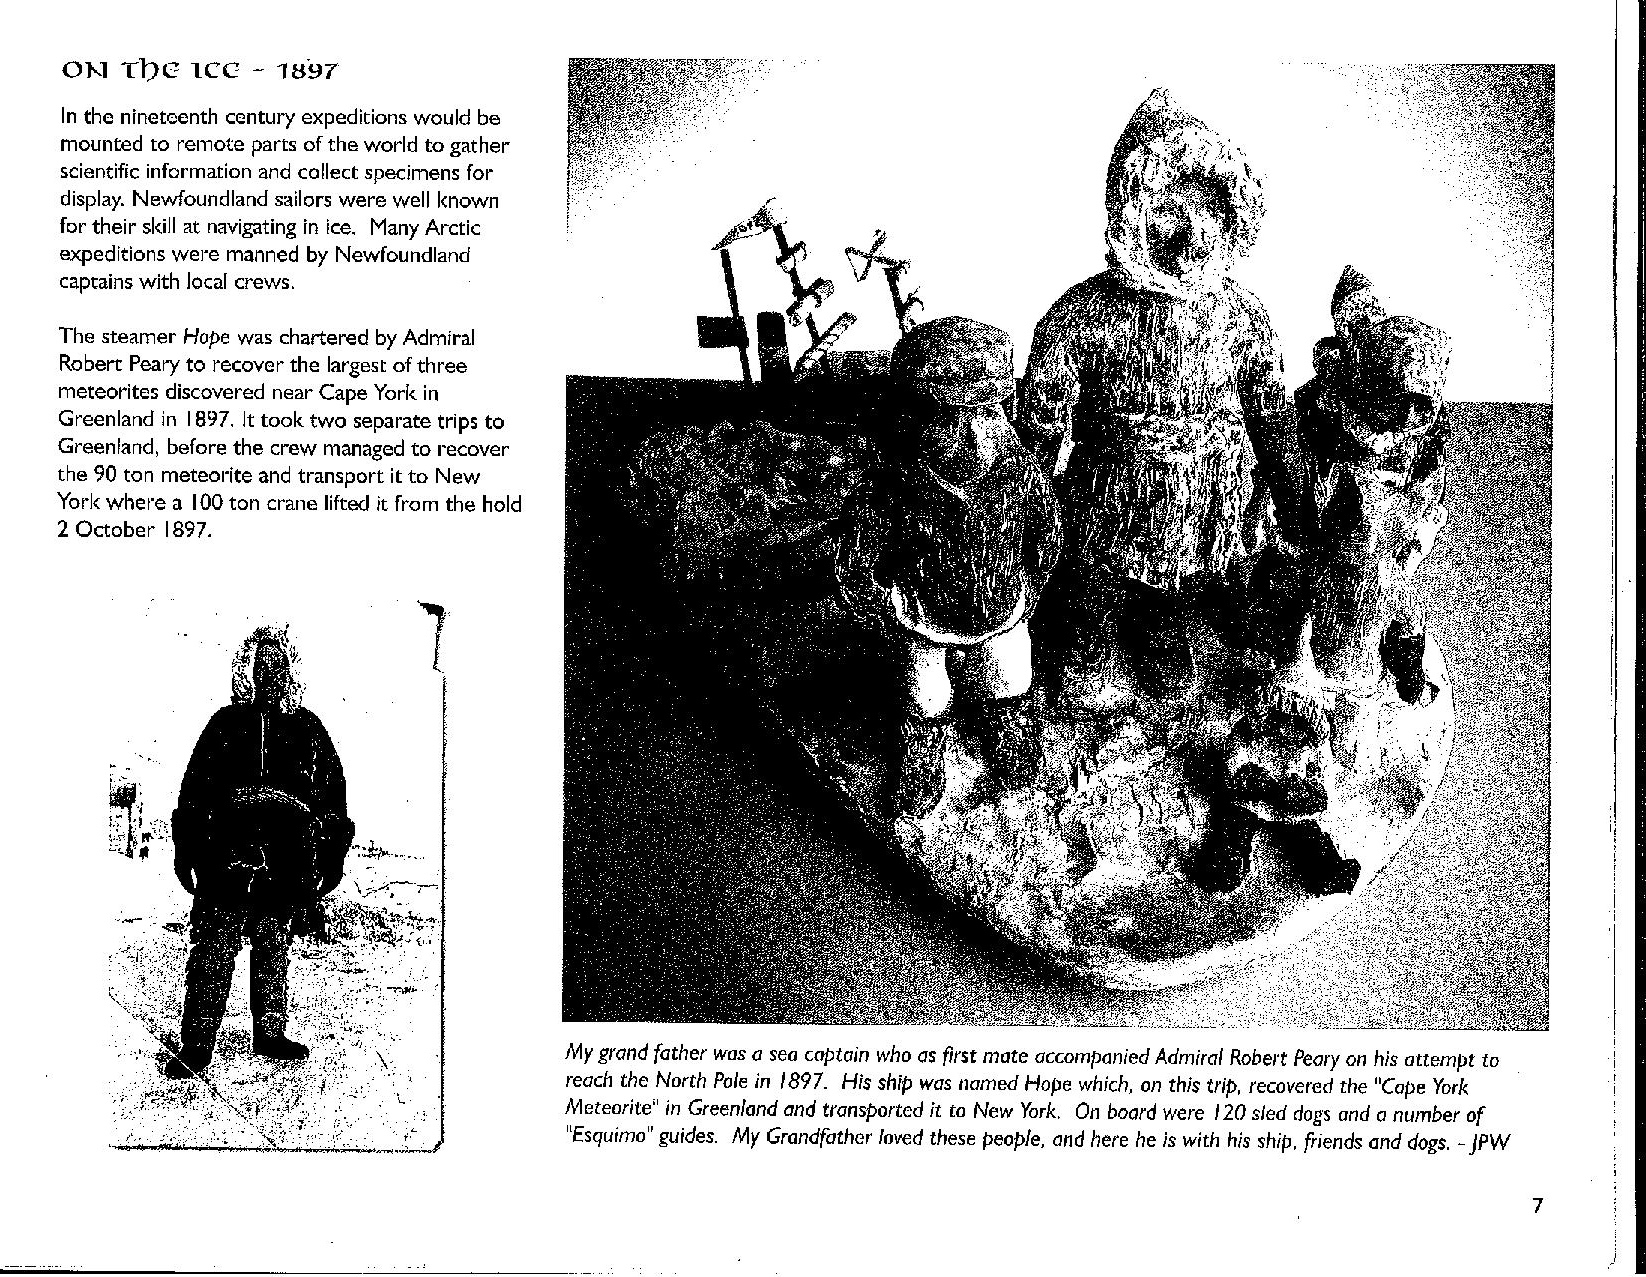 info@historicsites.ca_20190717_084930-page-001 2.jpg